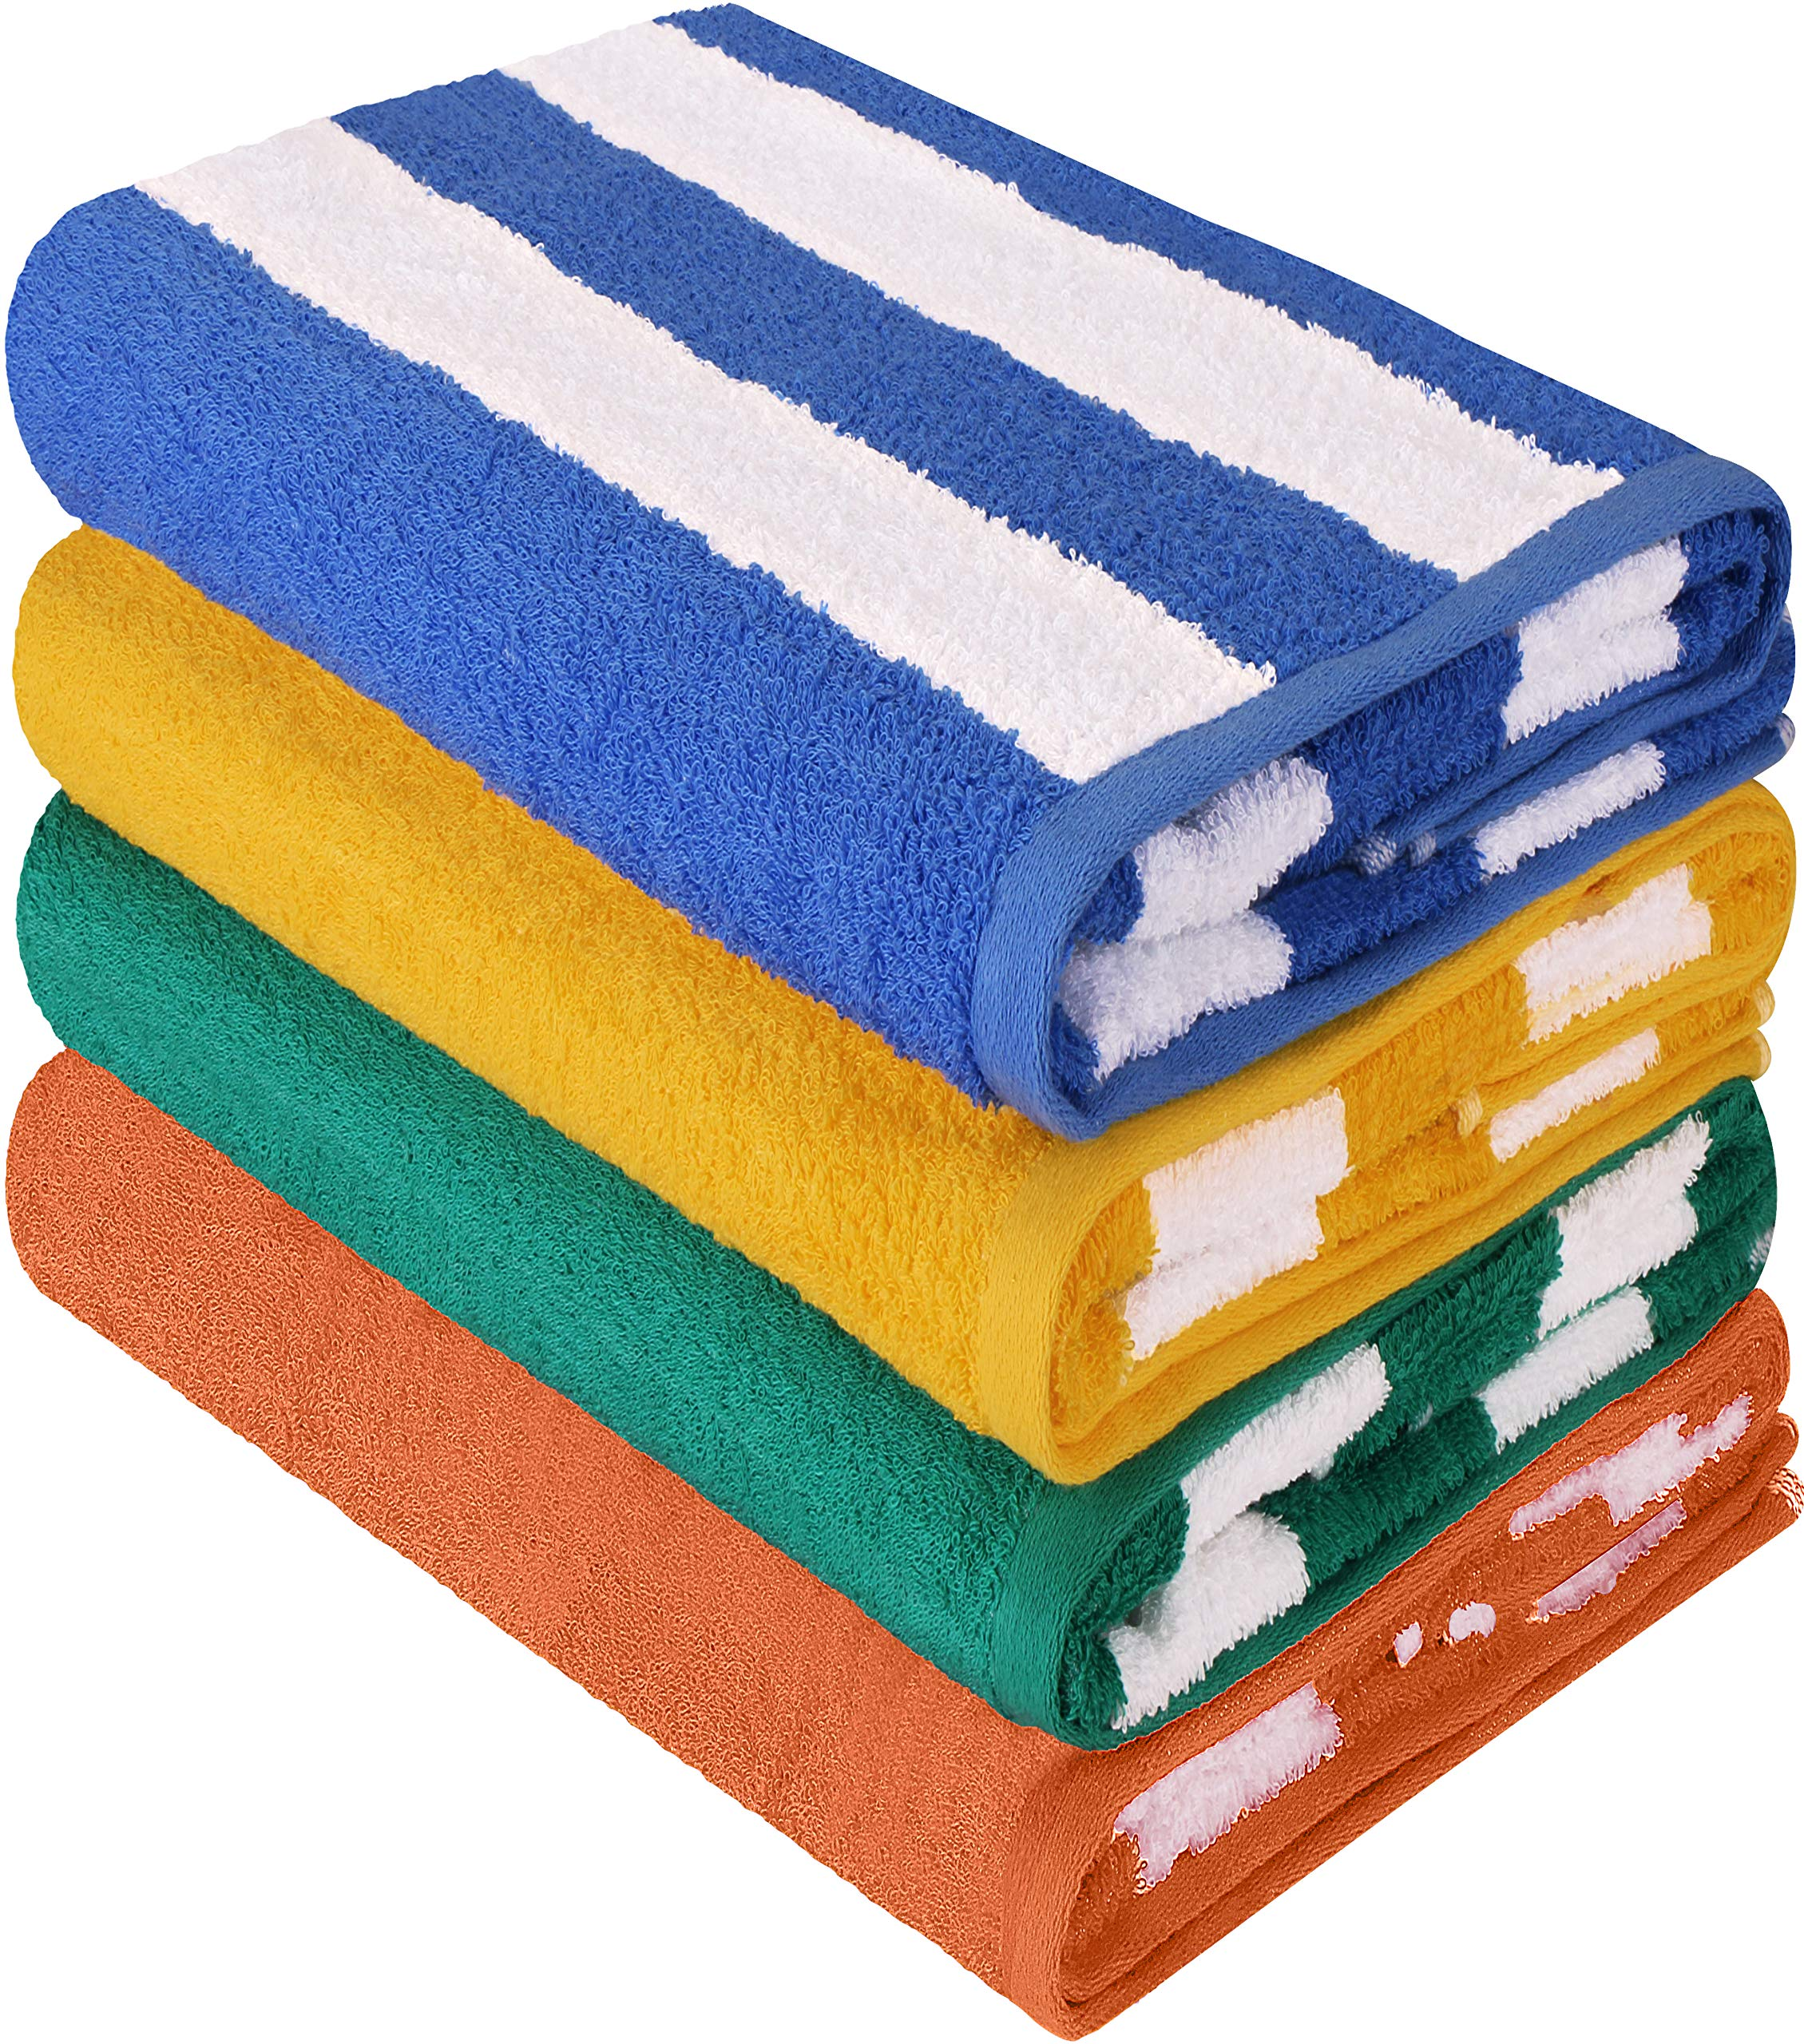 Utopia Towels Cabana Stripe Inches